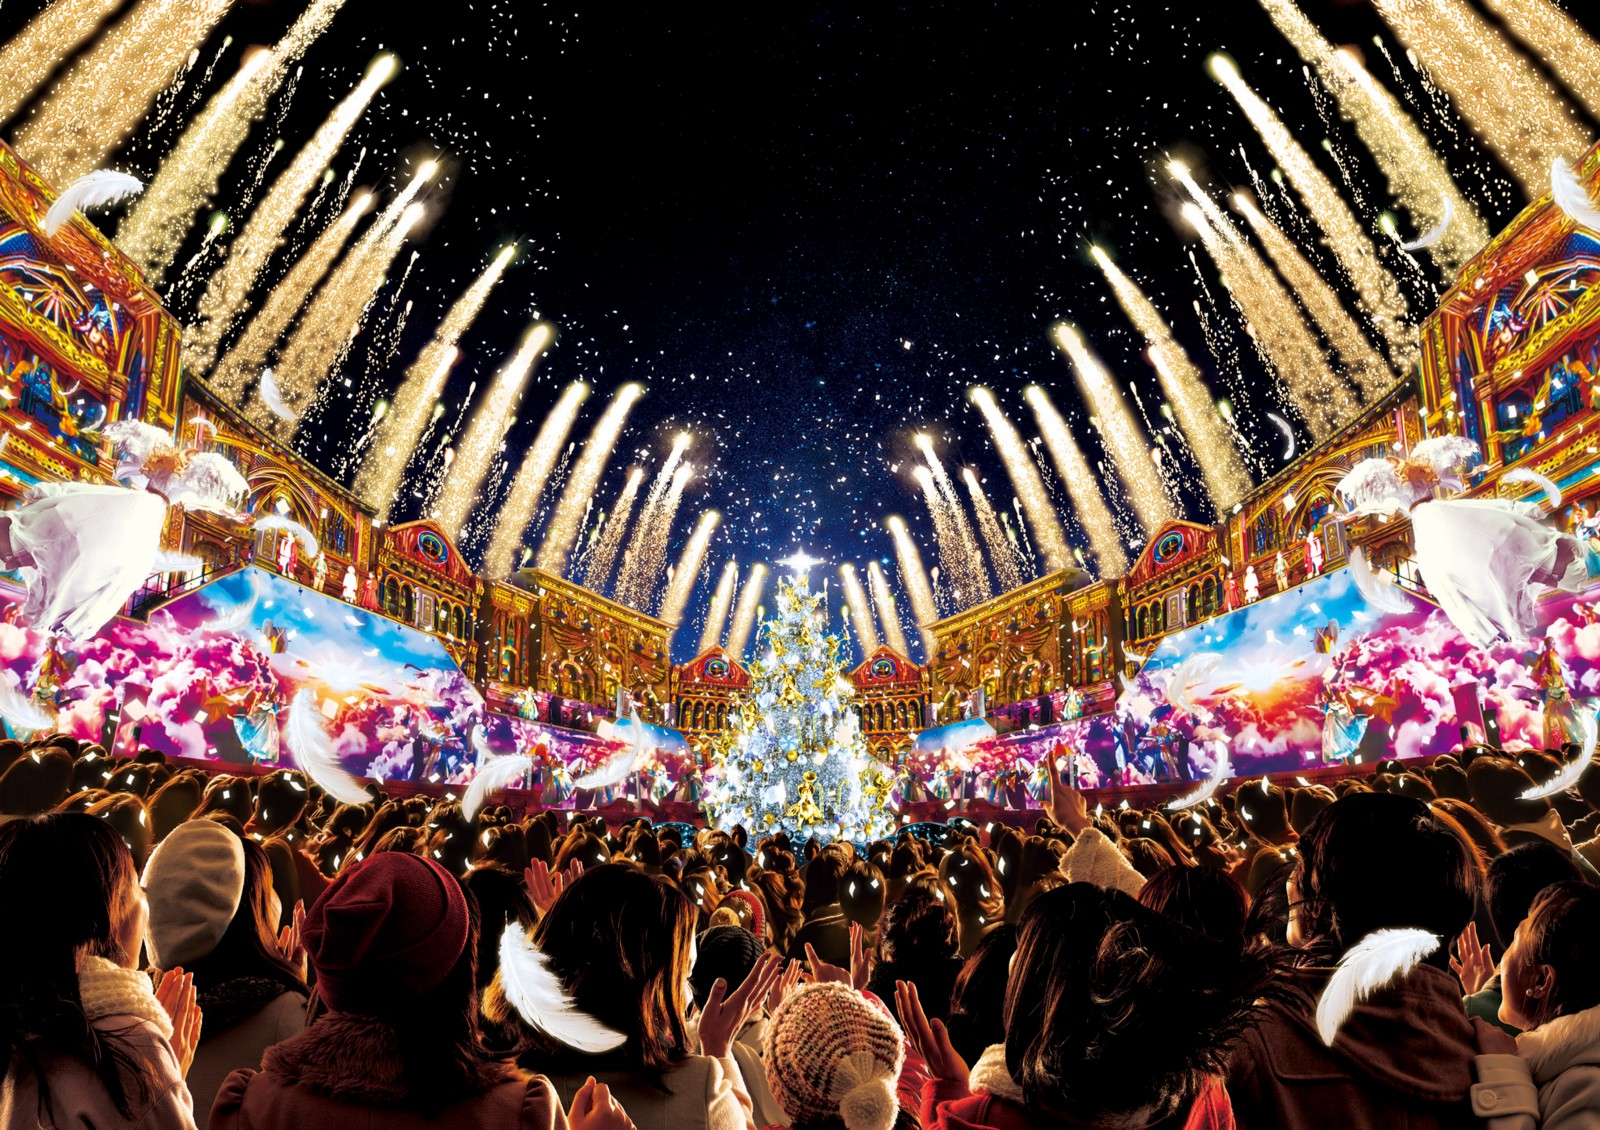 Universal Studios Christmas.2018 Universal Studios Japan Christmas Japan Web Magazine